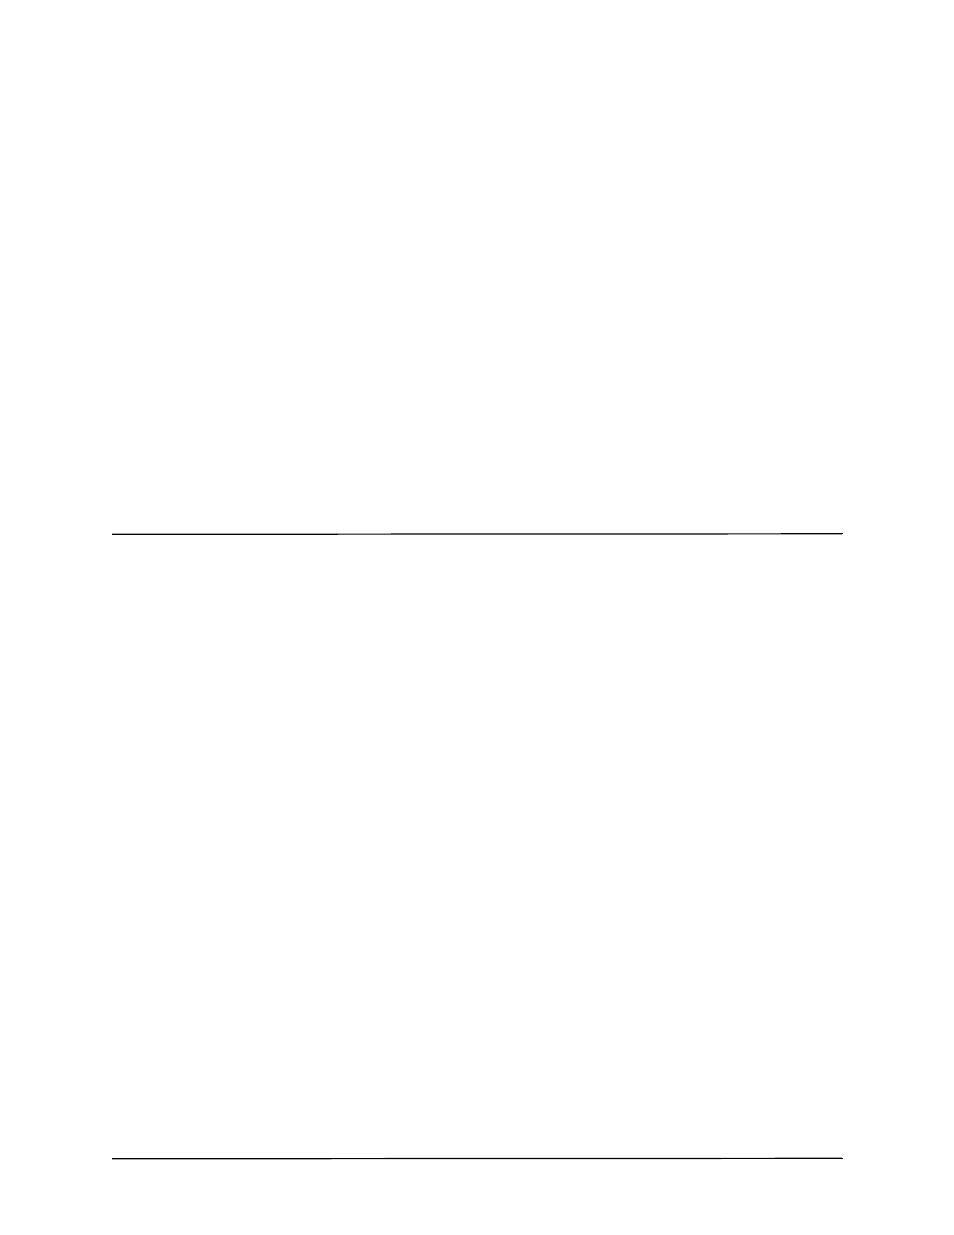 Rev Tech Service Manual Revtech Engine Diagram Troubleshooting Overview X Series Error Messages Zoll Rh Manualsdir Com 6 Speed